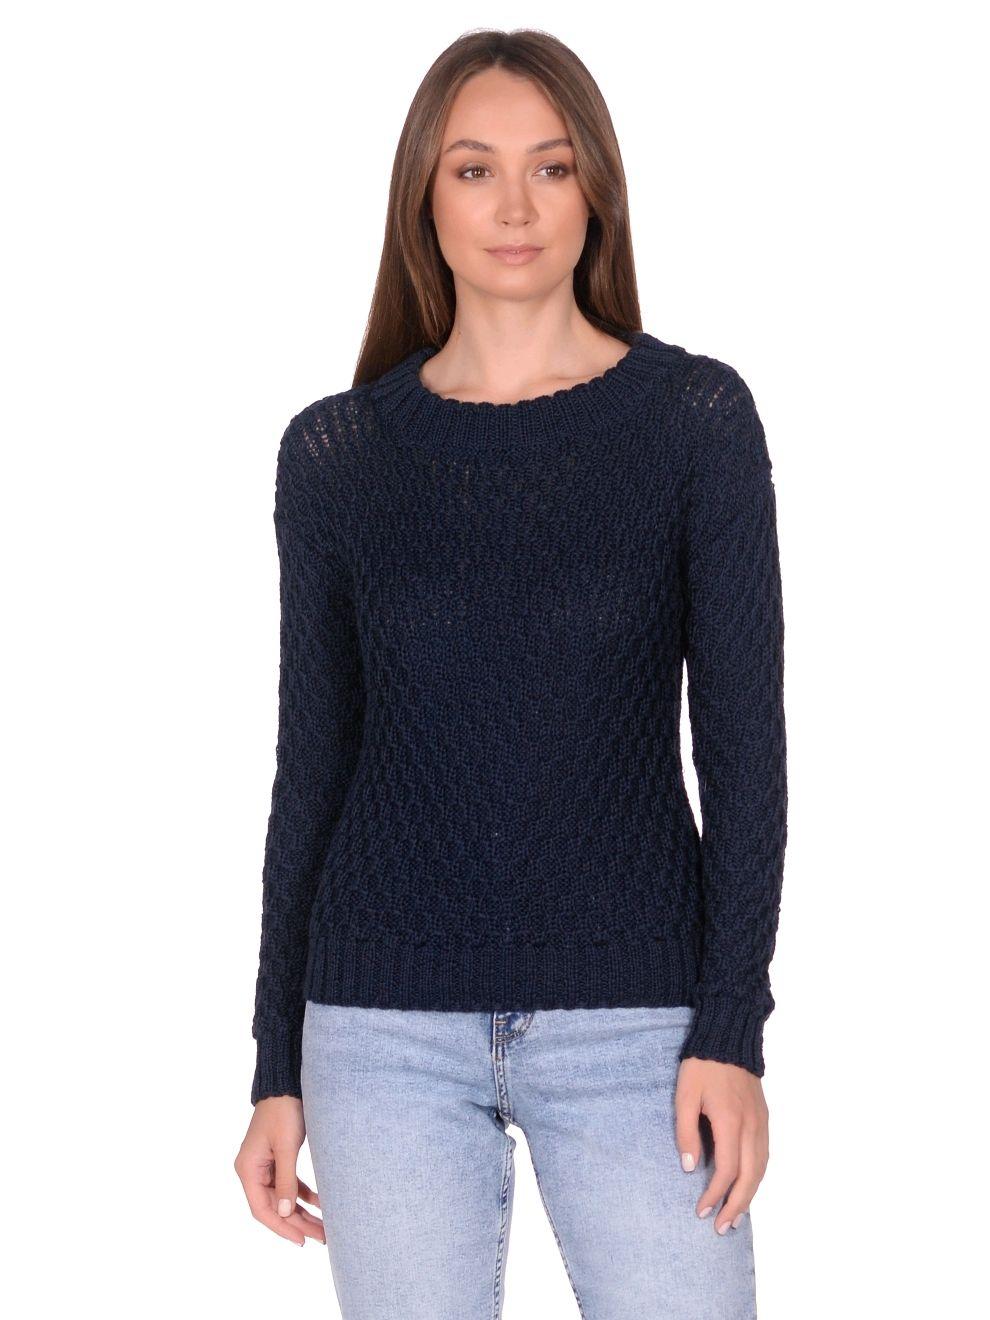 Women's 'Hive' sweater', Sweaters, St. Petersburg,  Фото №1